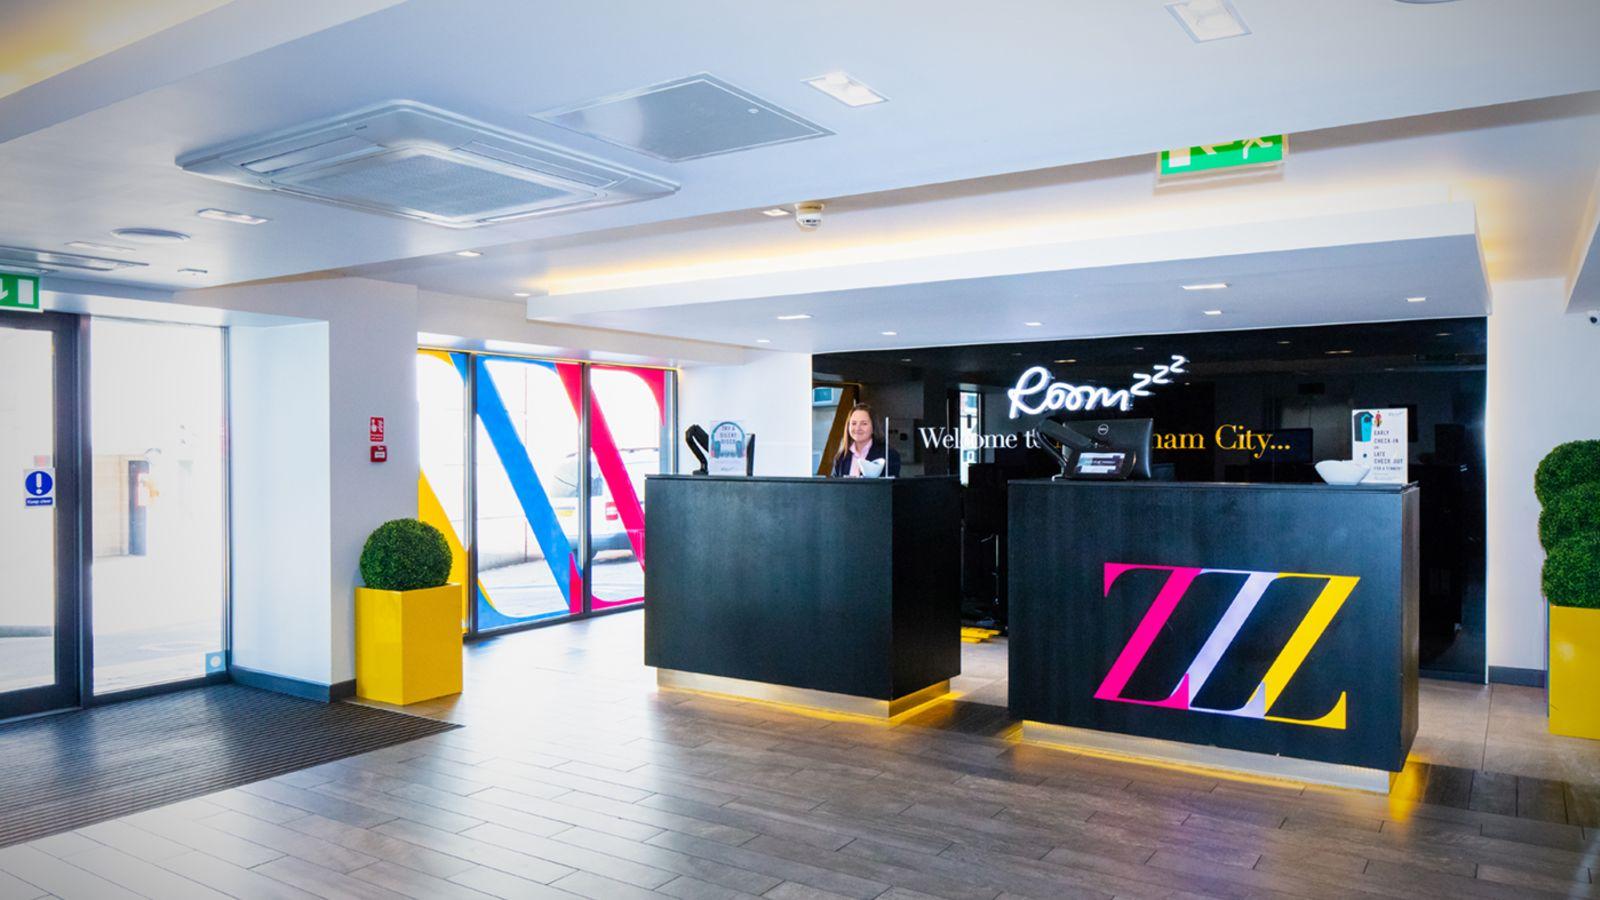 24 hour reception desk at IconInc @ Roomzzz Nottingham